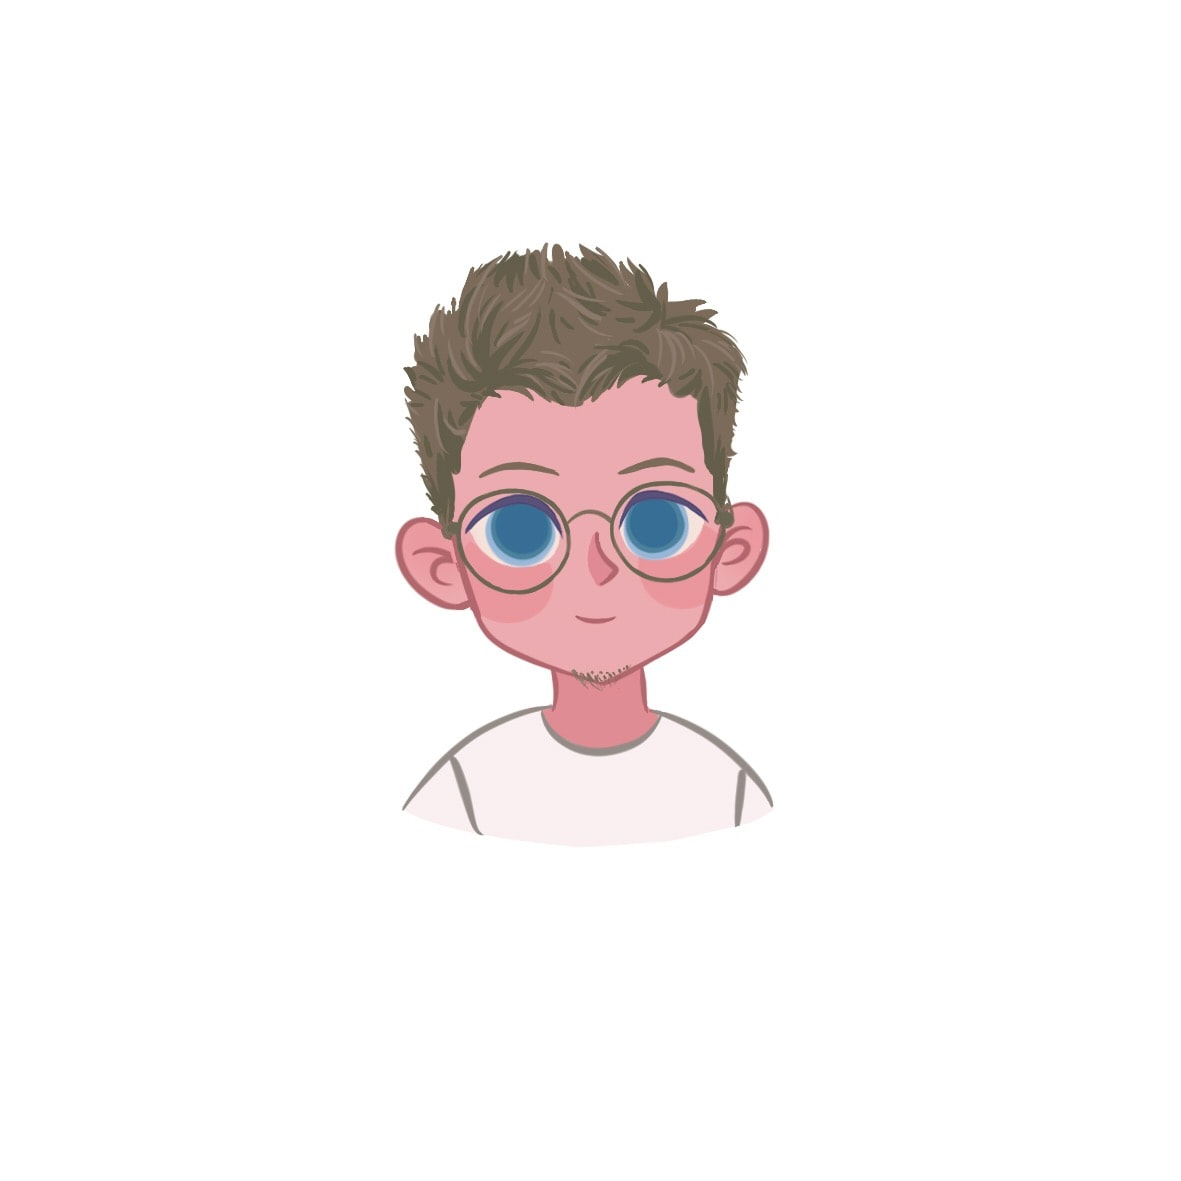 Go to Zanwei Guo's profile